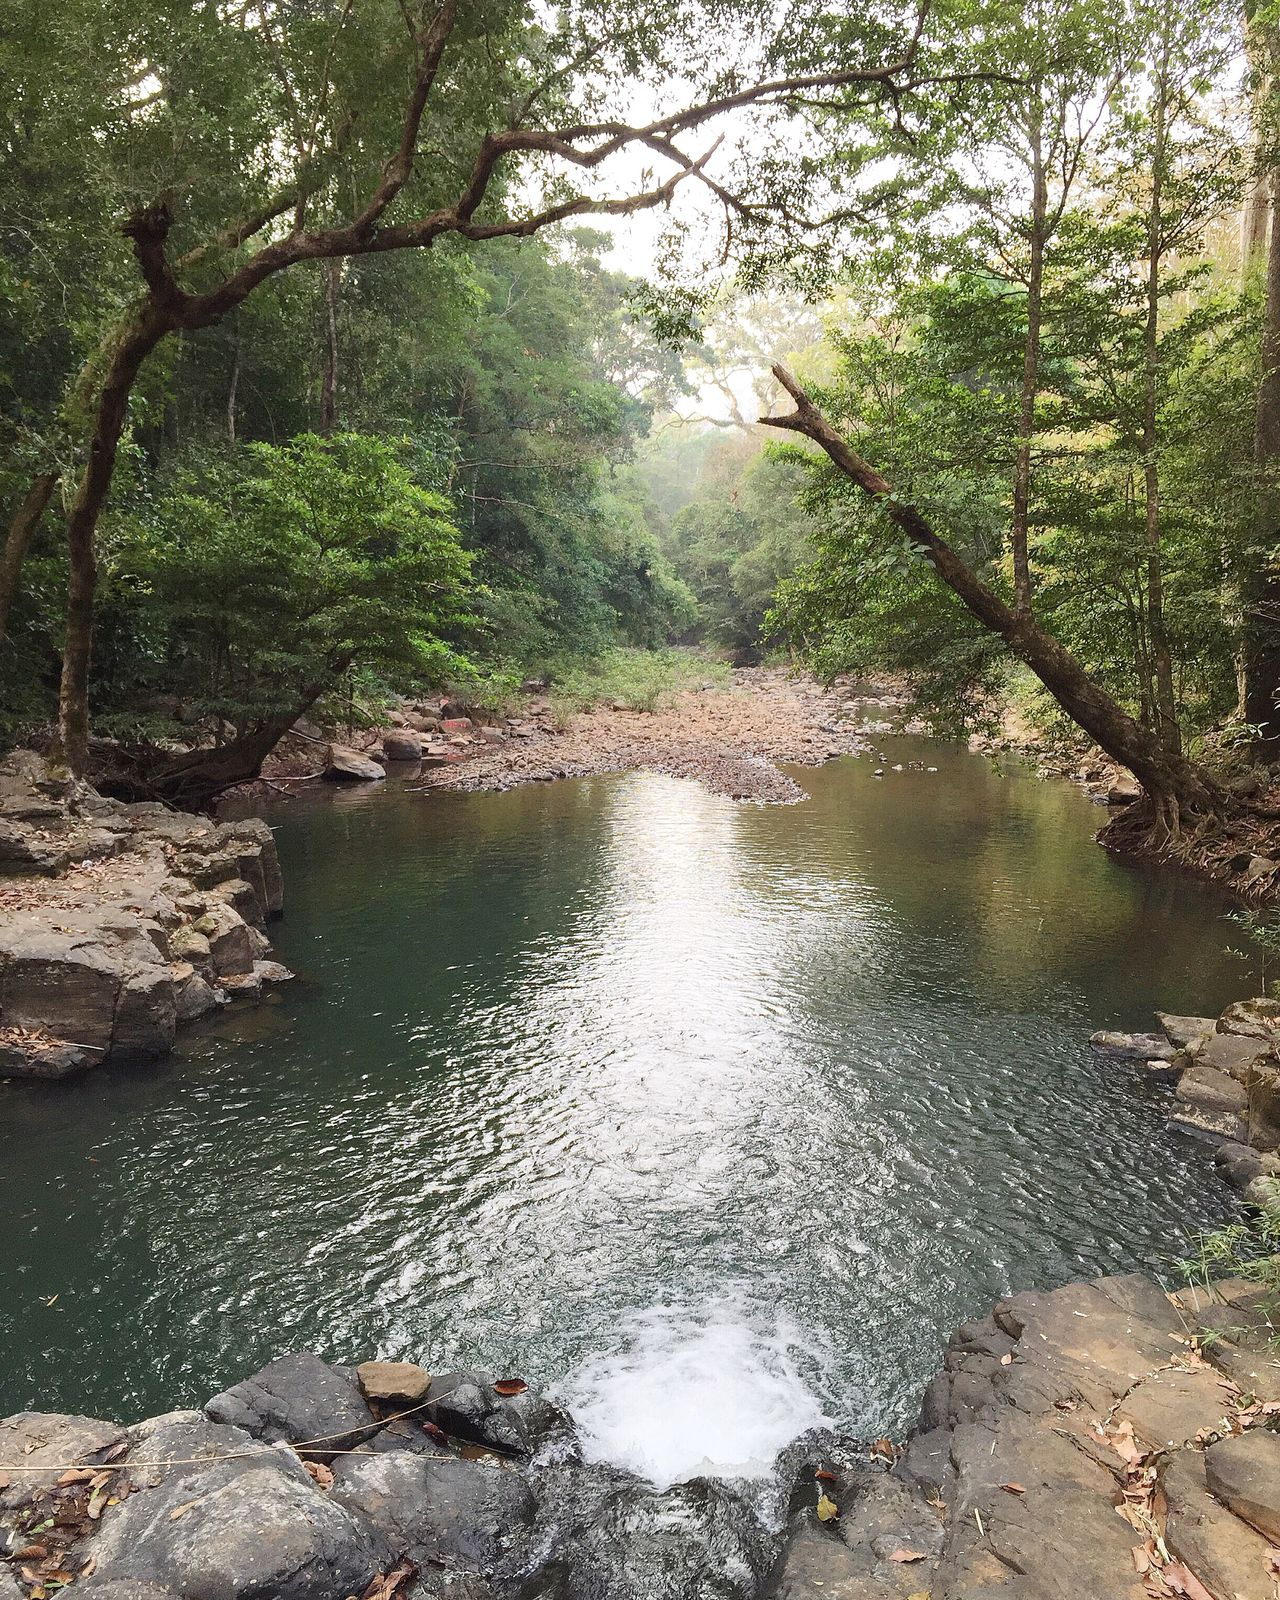 Bugiamap Nationalpark Vietnam Trip Traveling Stream Trees Lake Camping Trekking Forest Nature Backpacking Thebroadlife